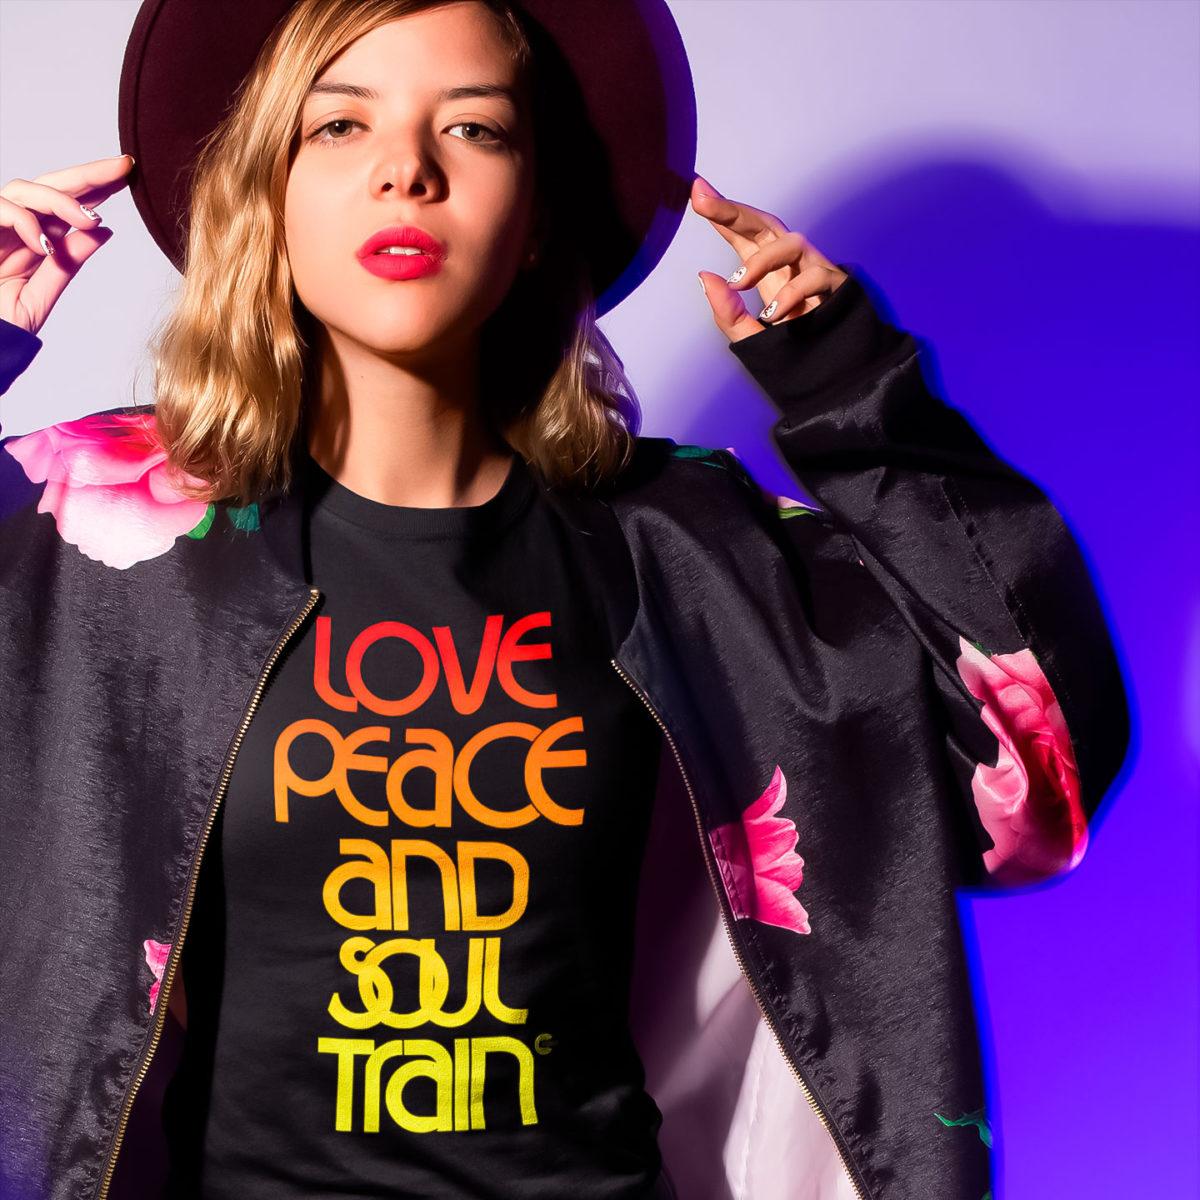 Camiseta Cullt Soul Train